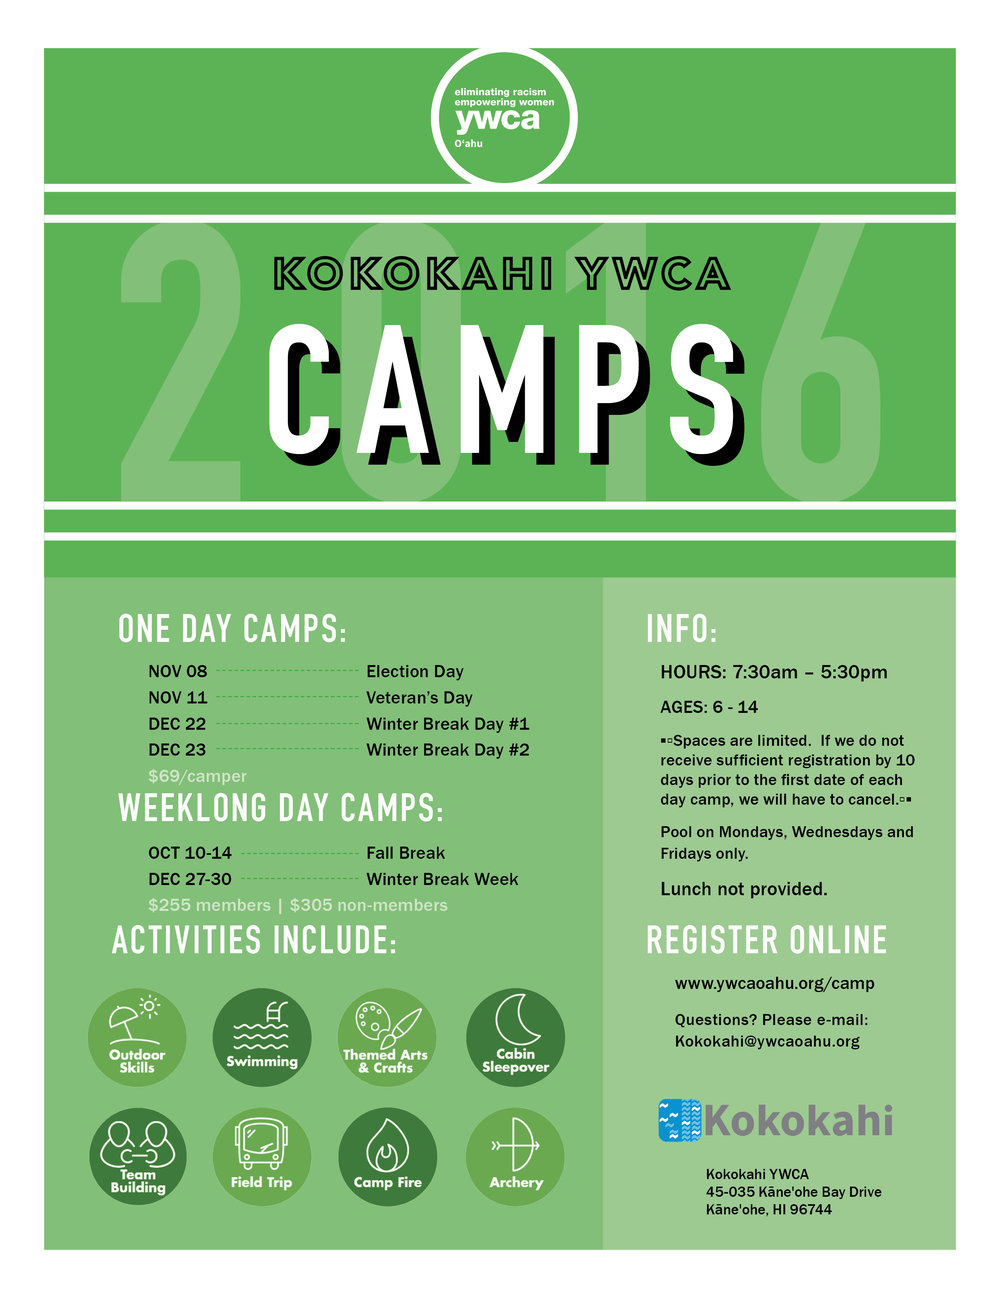 Kokokahi Camps flyer.jpg